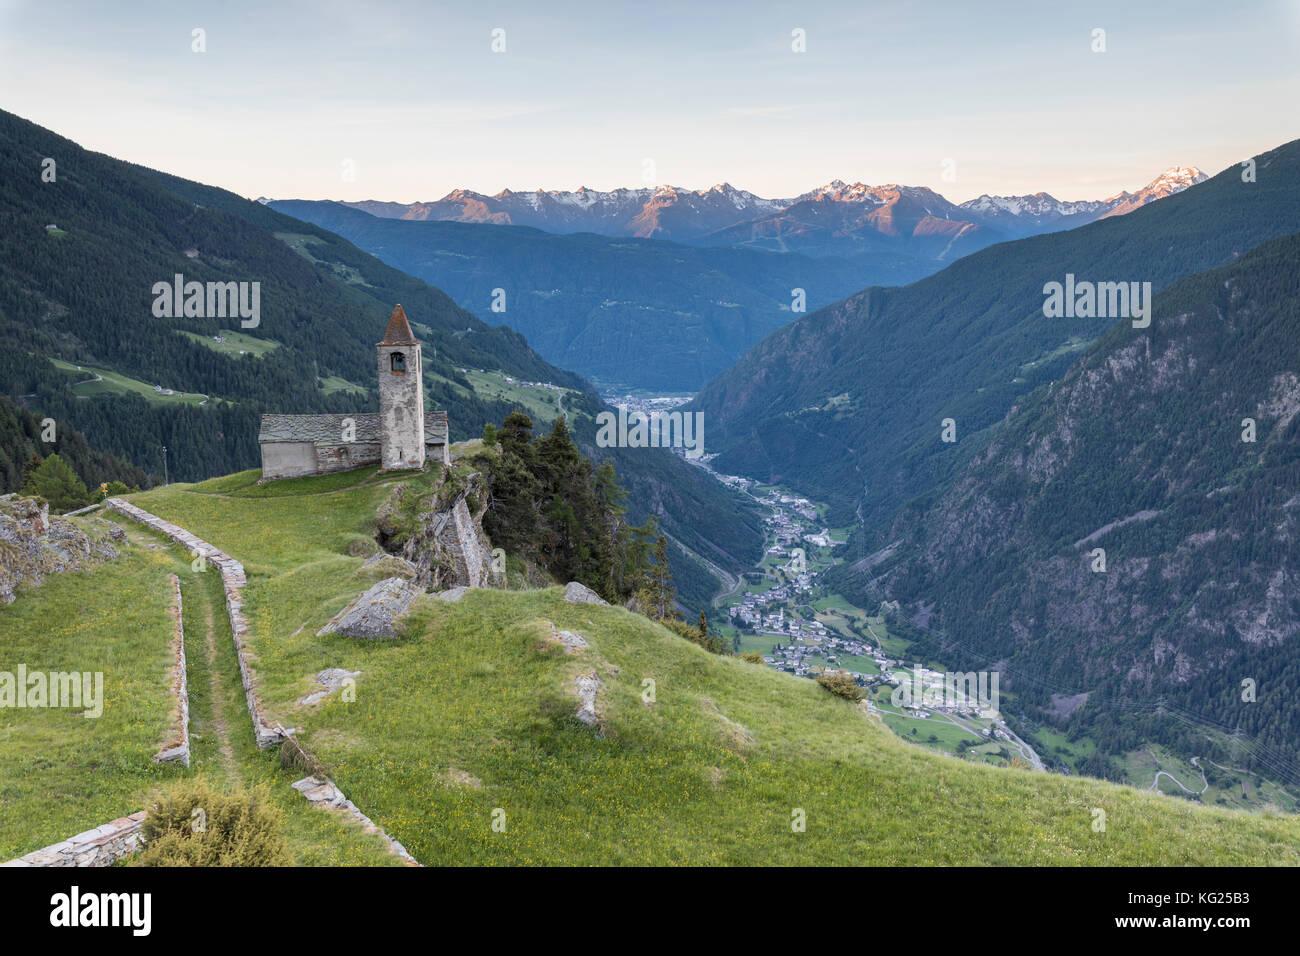 Alte Kirche bei Sonnenaufgang, San romerio Alp, Graubünden, Kanton Graubünden, Puschlav, Schweiz, Europa Stockbild